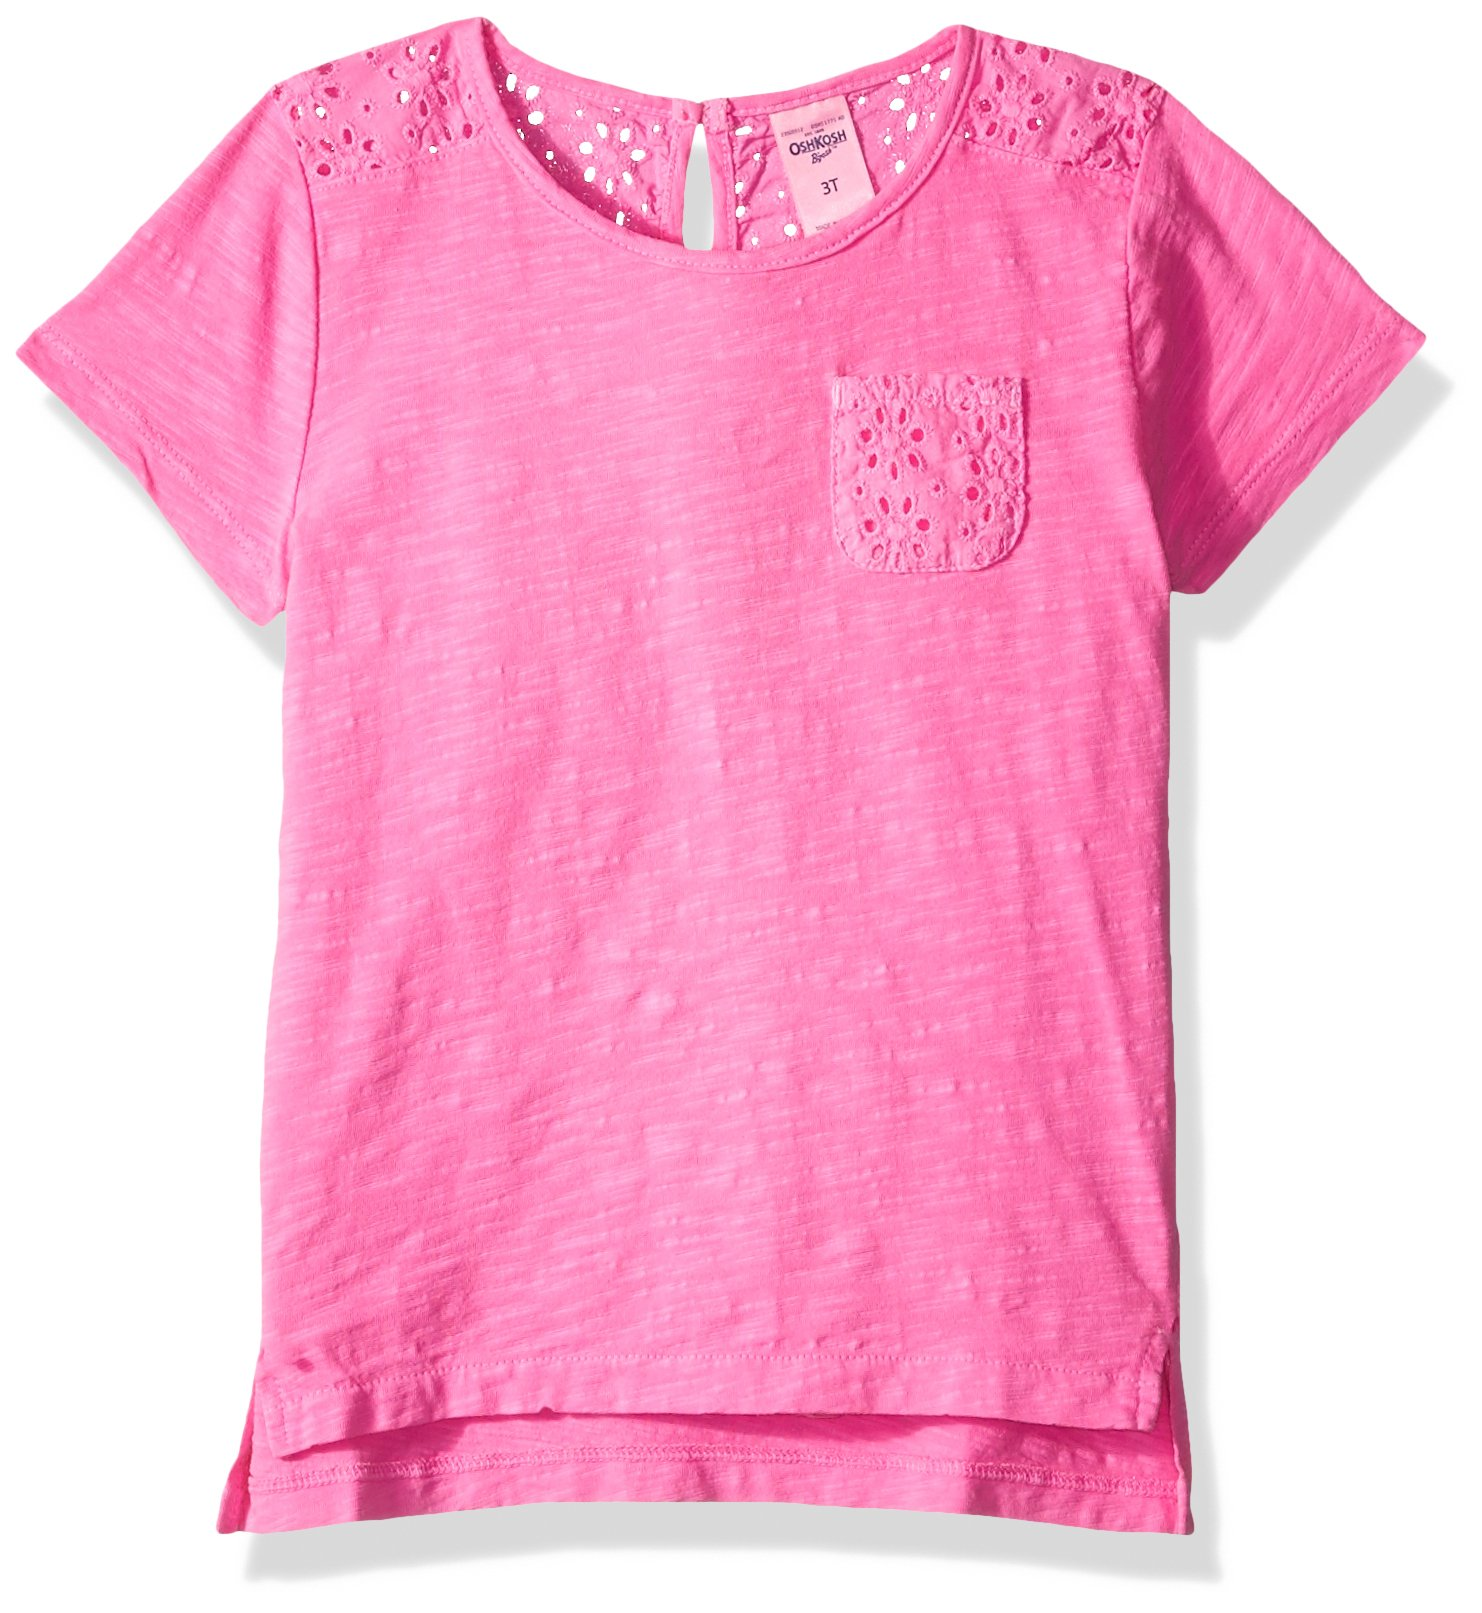 Osh Kosh Girls' Kids Fashion Tops, Pink, 8